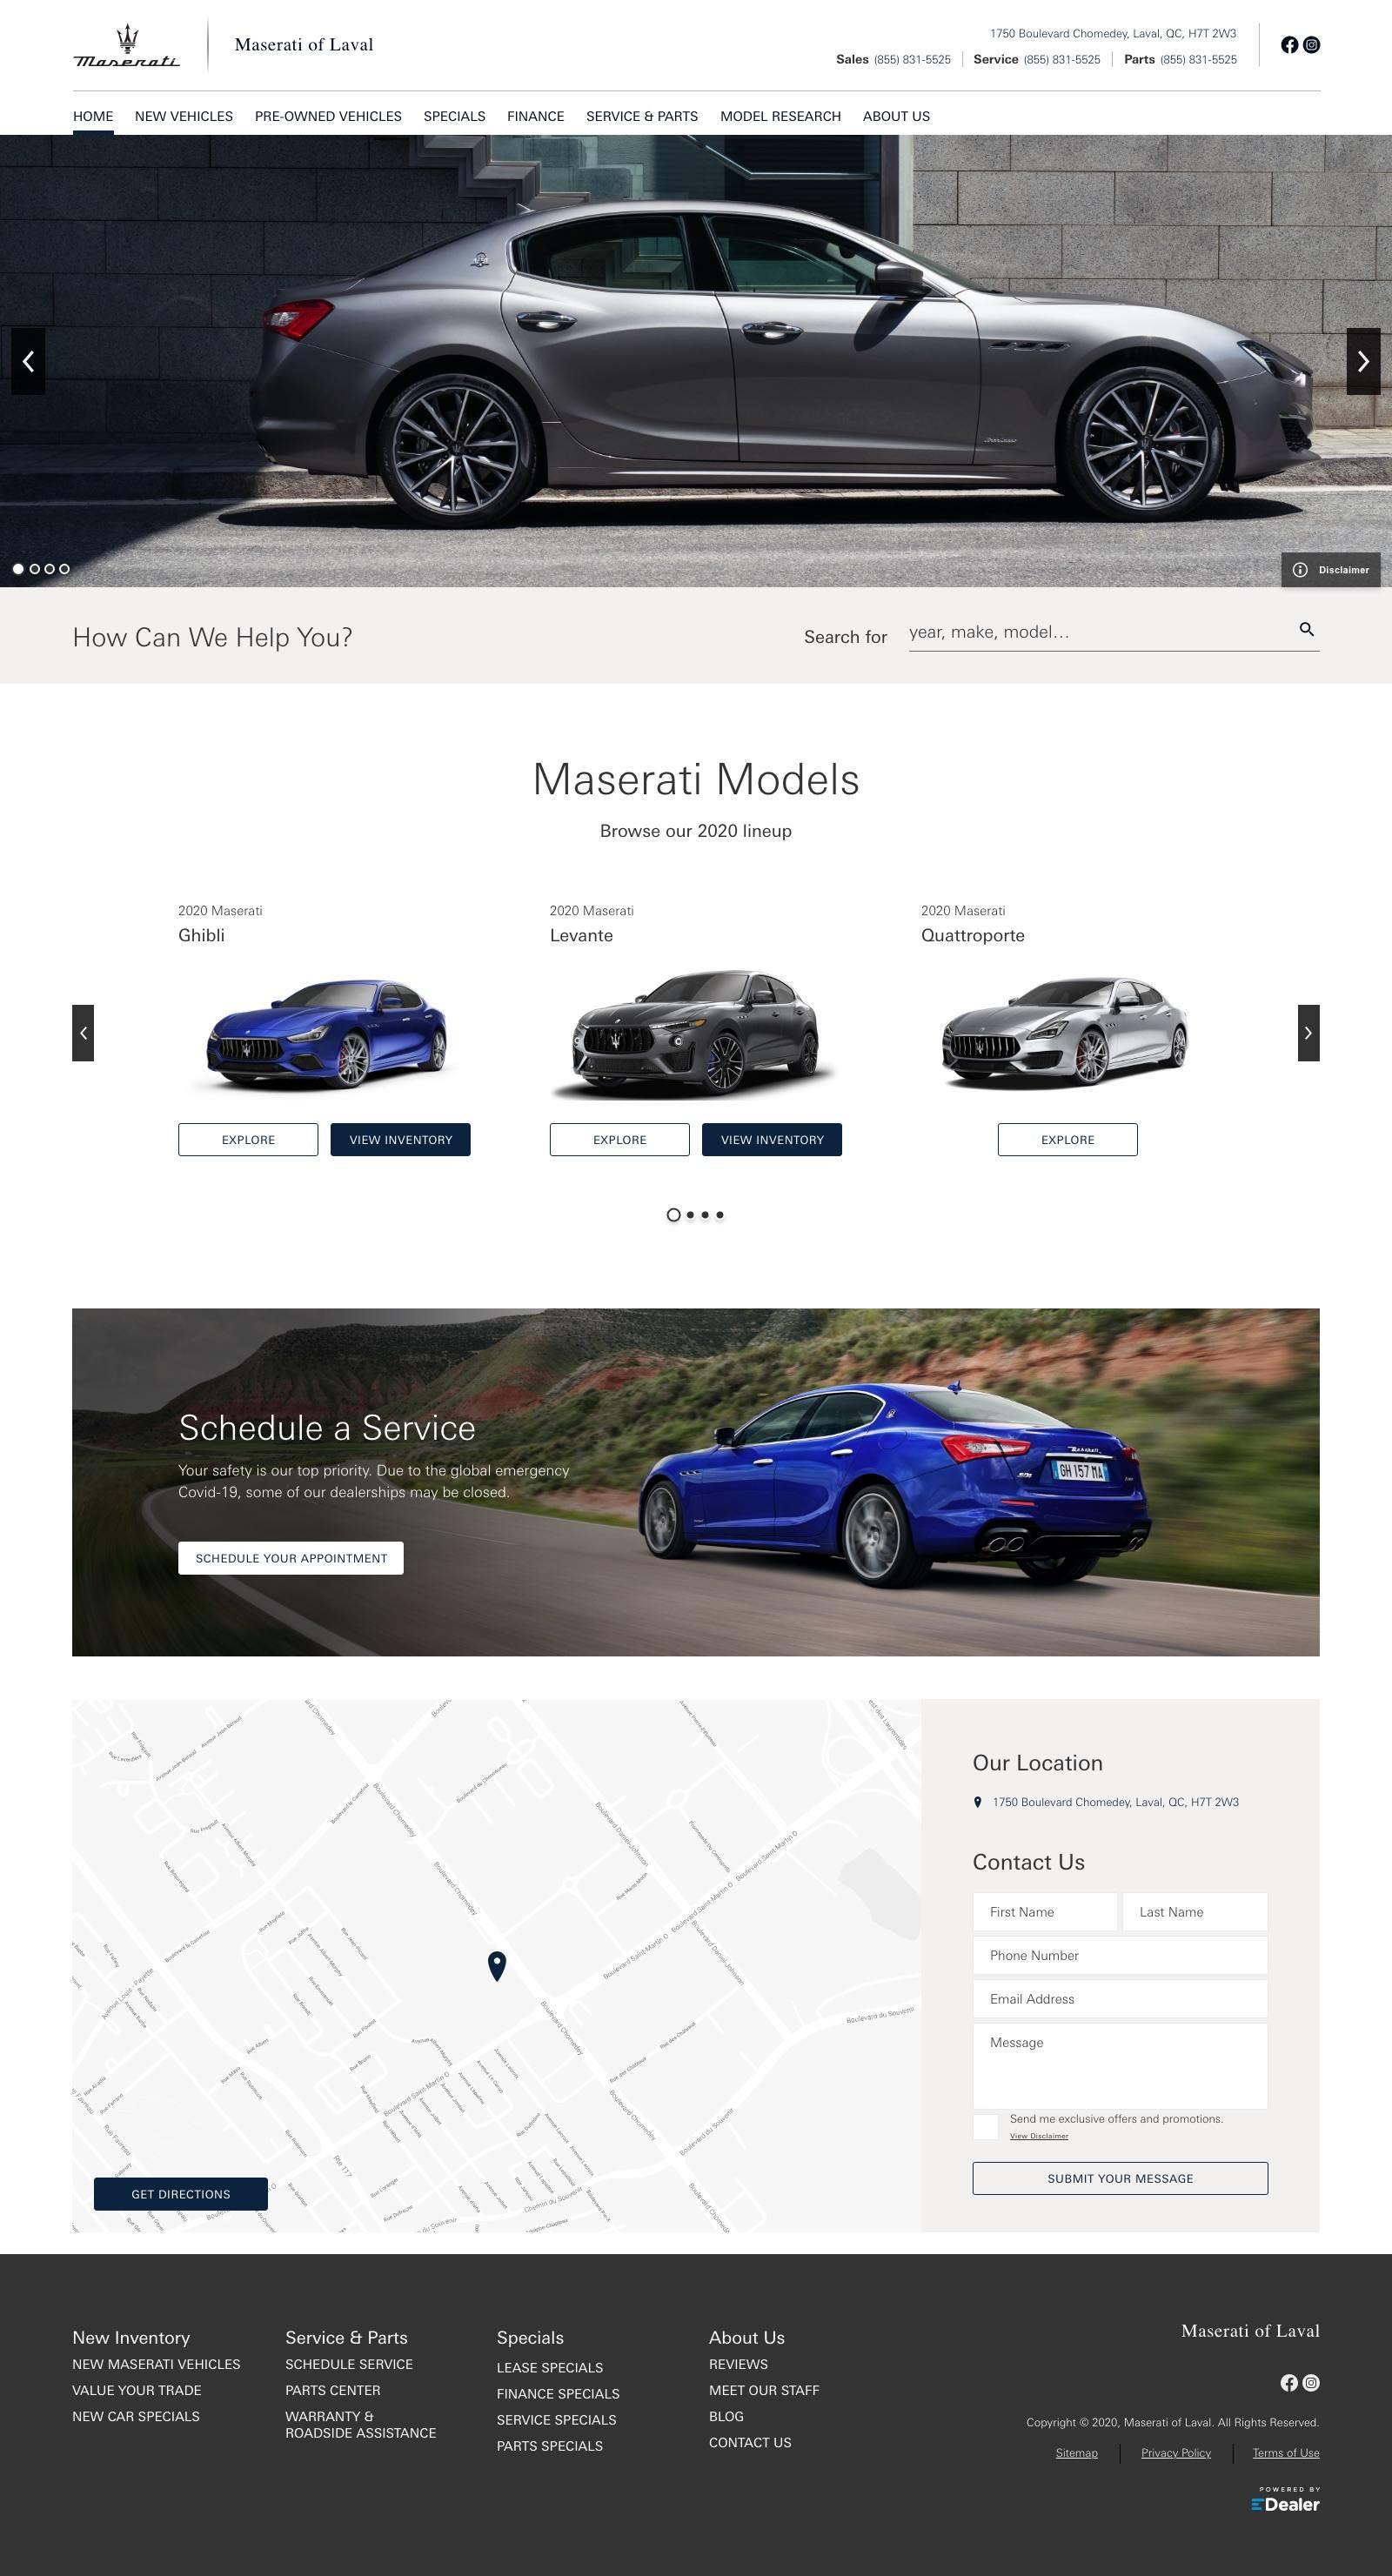 Maserati of Laval